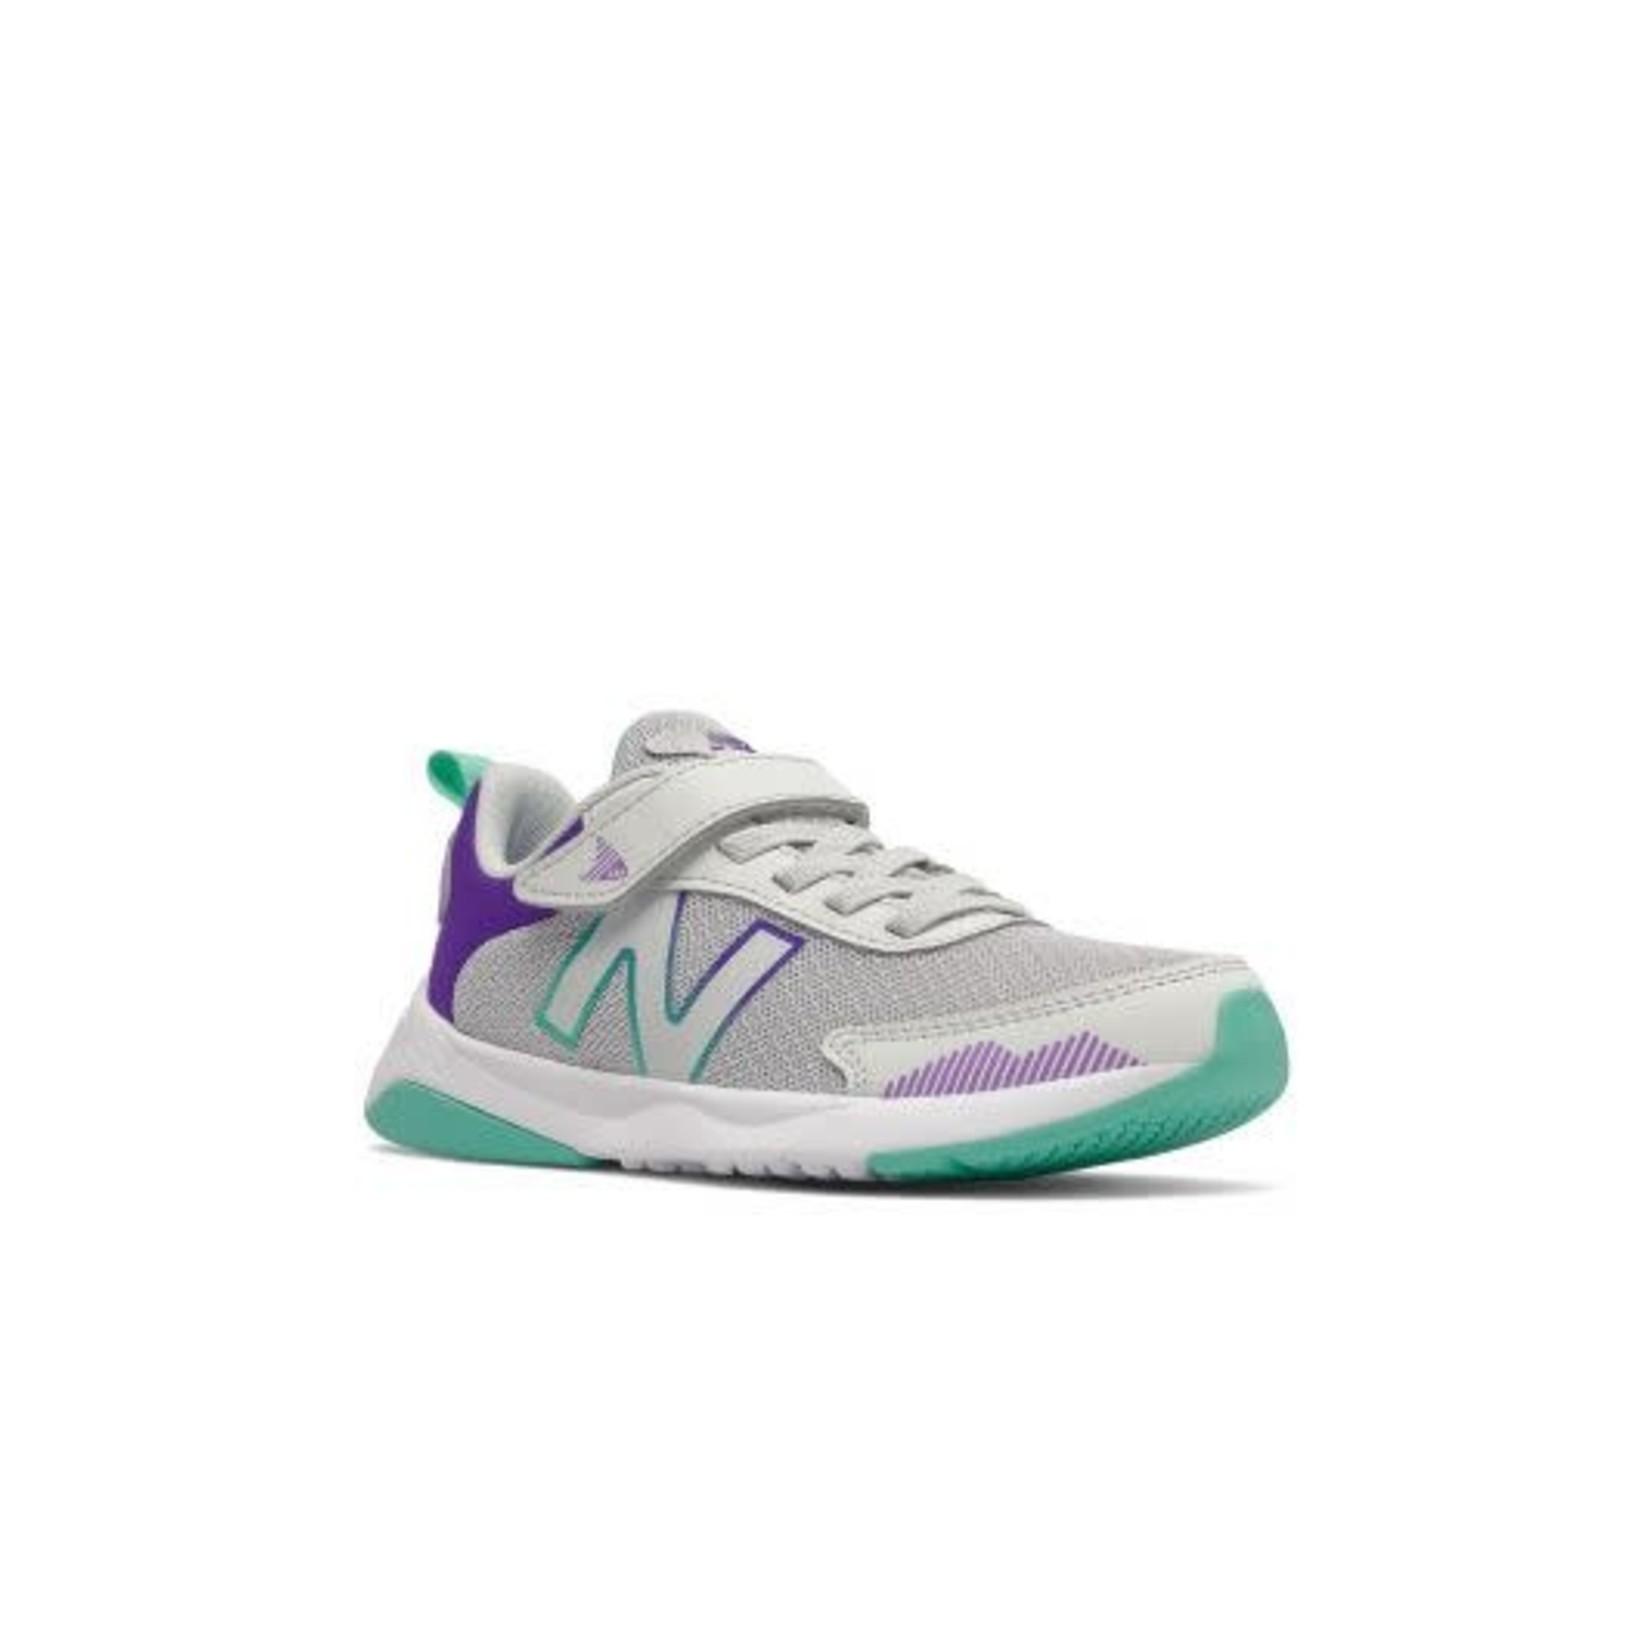 New Balance New Balance Running Shoes, 545, GPS, Girls